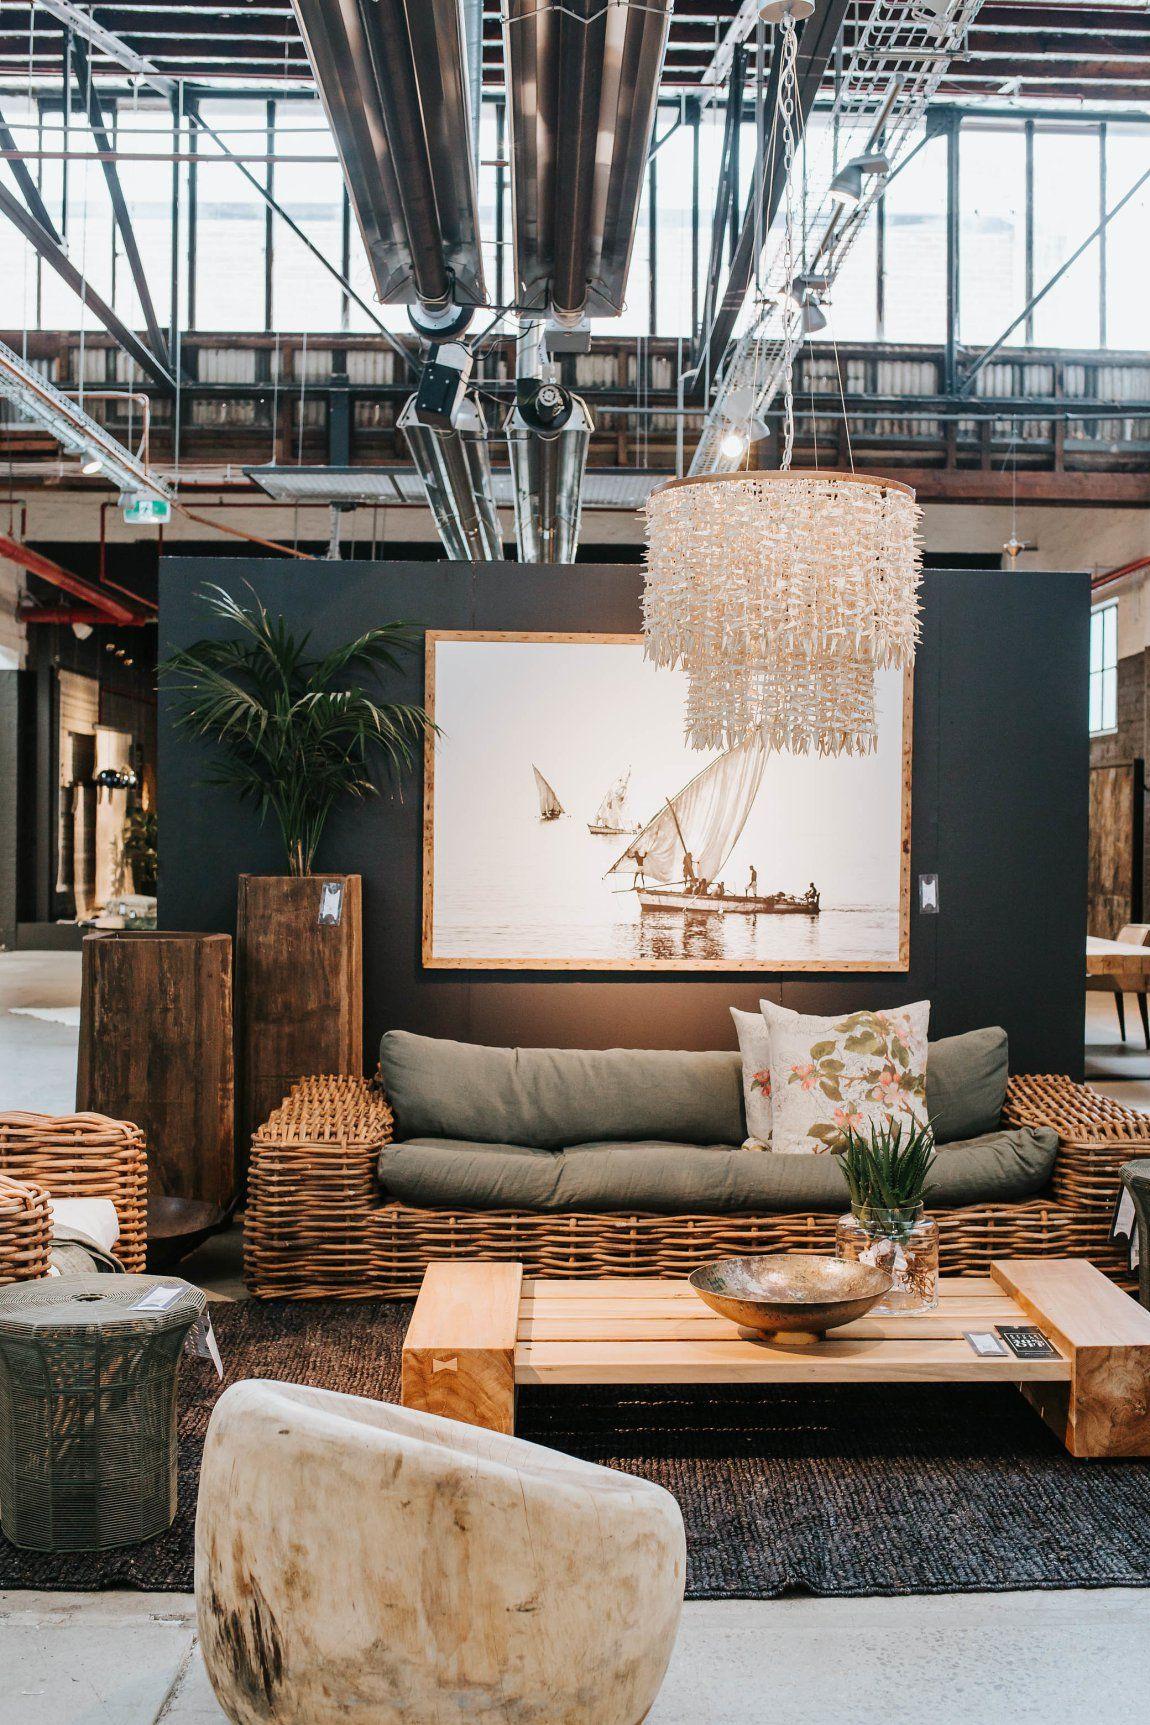 Melbourne, Australia, furniture and homewares store, Weylandts  Eco